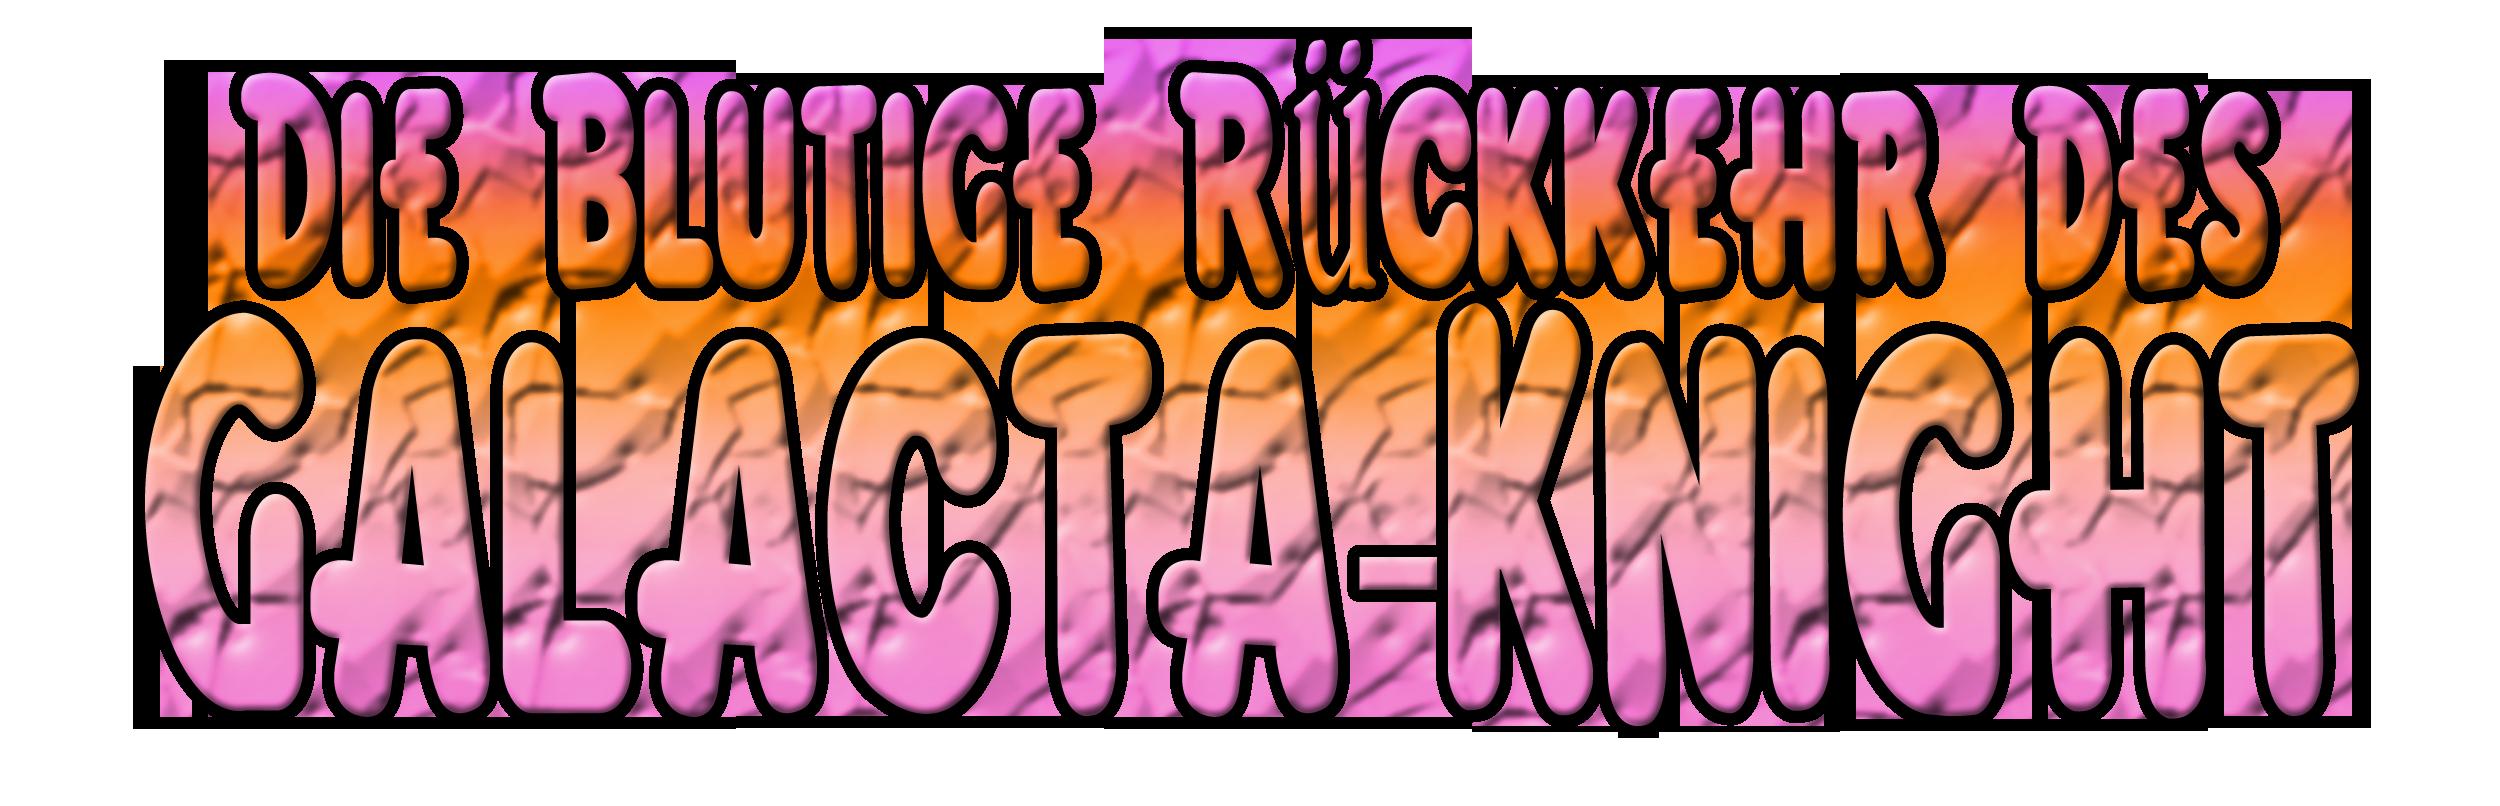 Die Blutige Ruckkehr des Galacta Knight Logo by KingAsylus91